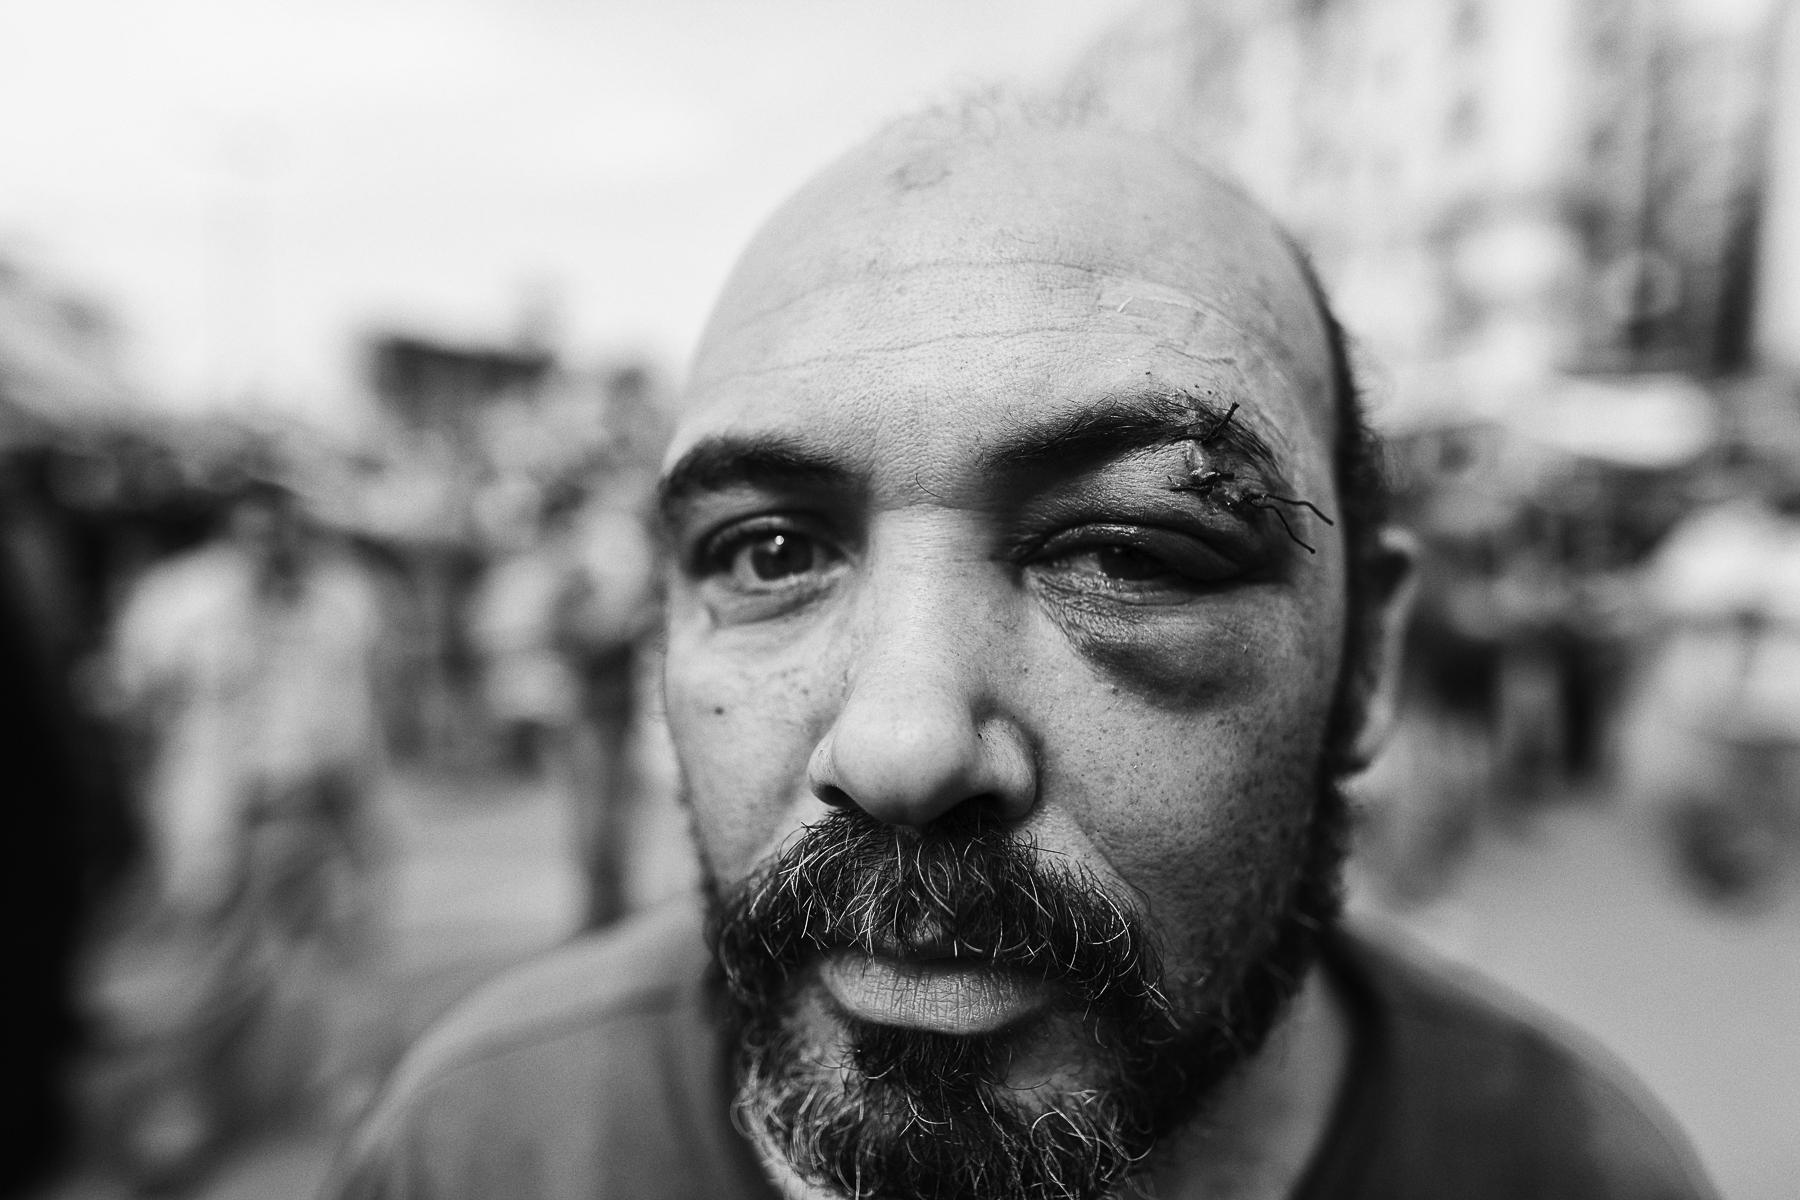 Egypte, février 2011. Place Tahir le Caire, après la bataile.Egypte, February 2011. Cairo's Tahir square, after the fight.